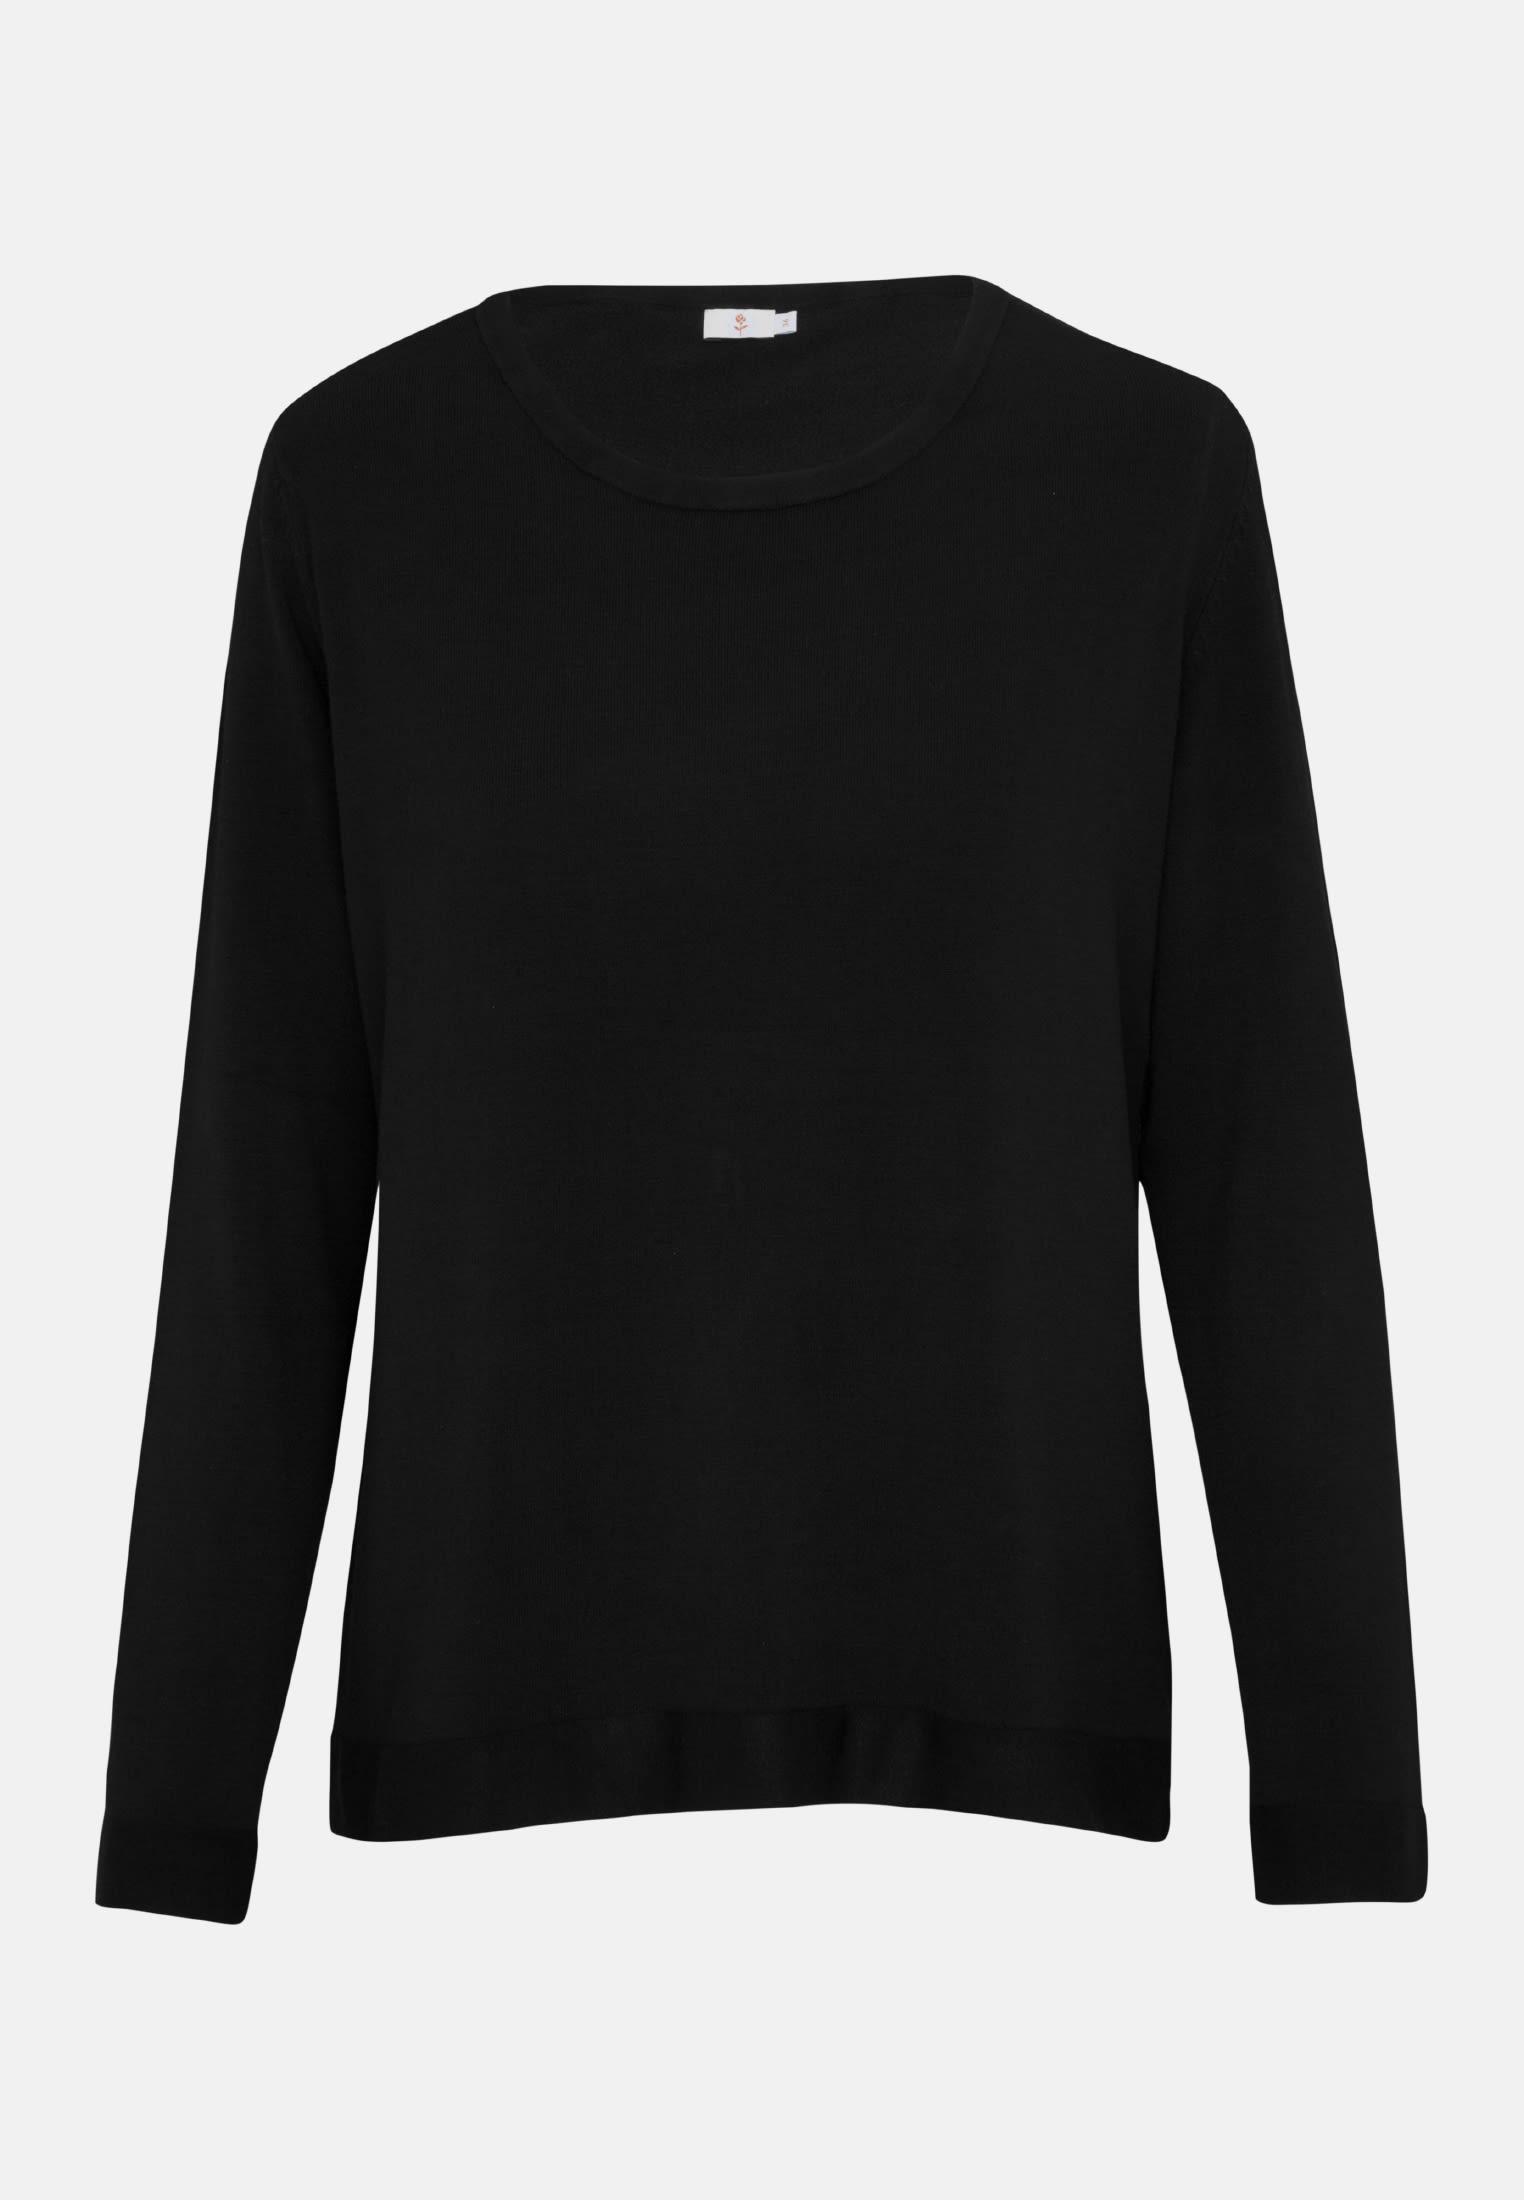 Crew Neck Pullover made of viscose blend in Black    Seidensticker Onlineshop